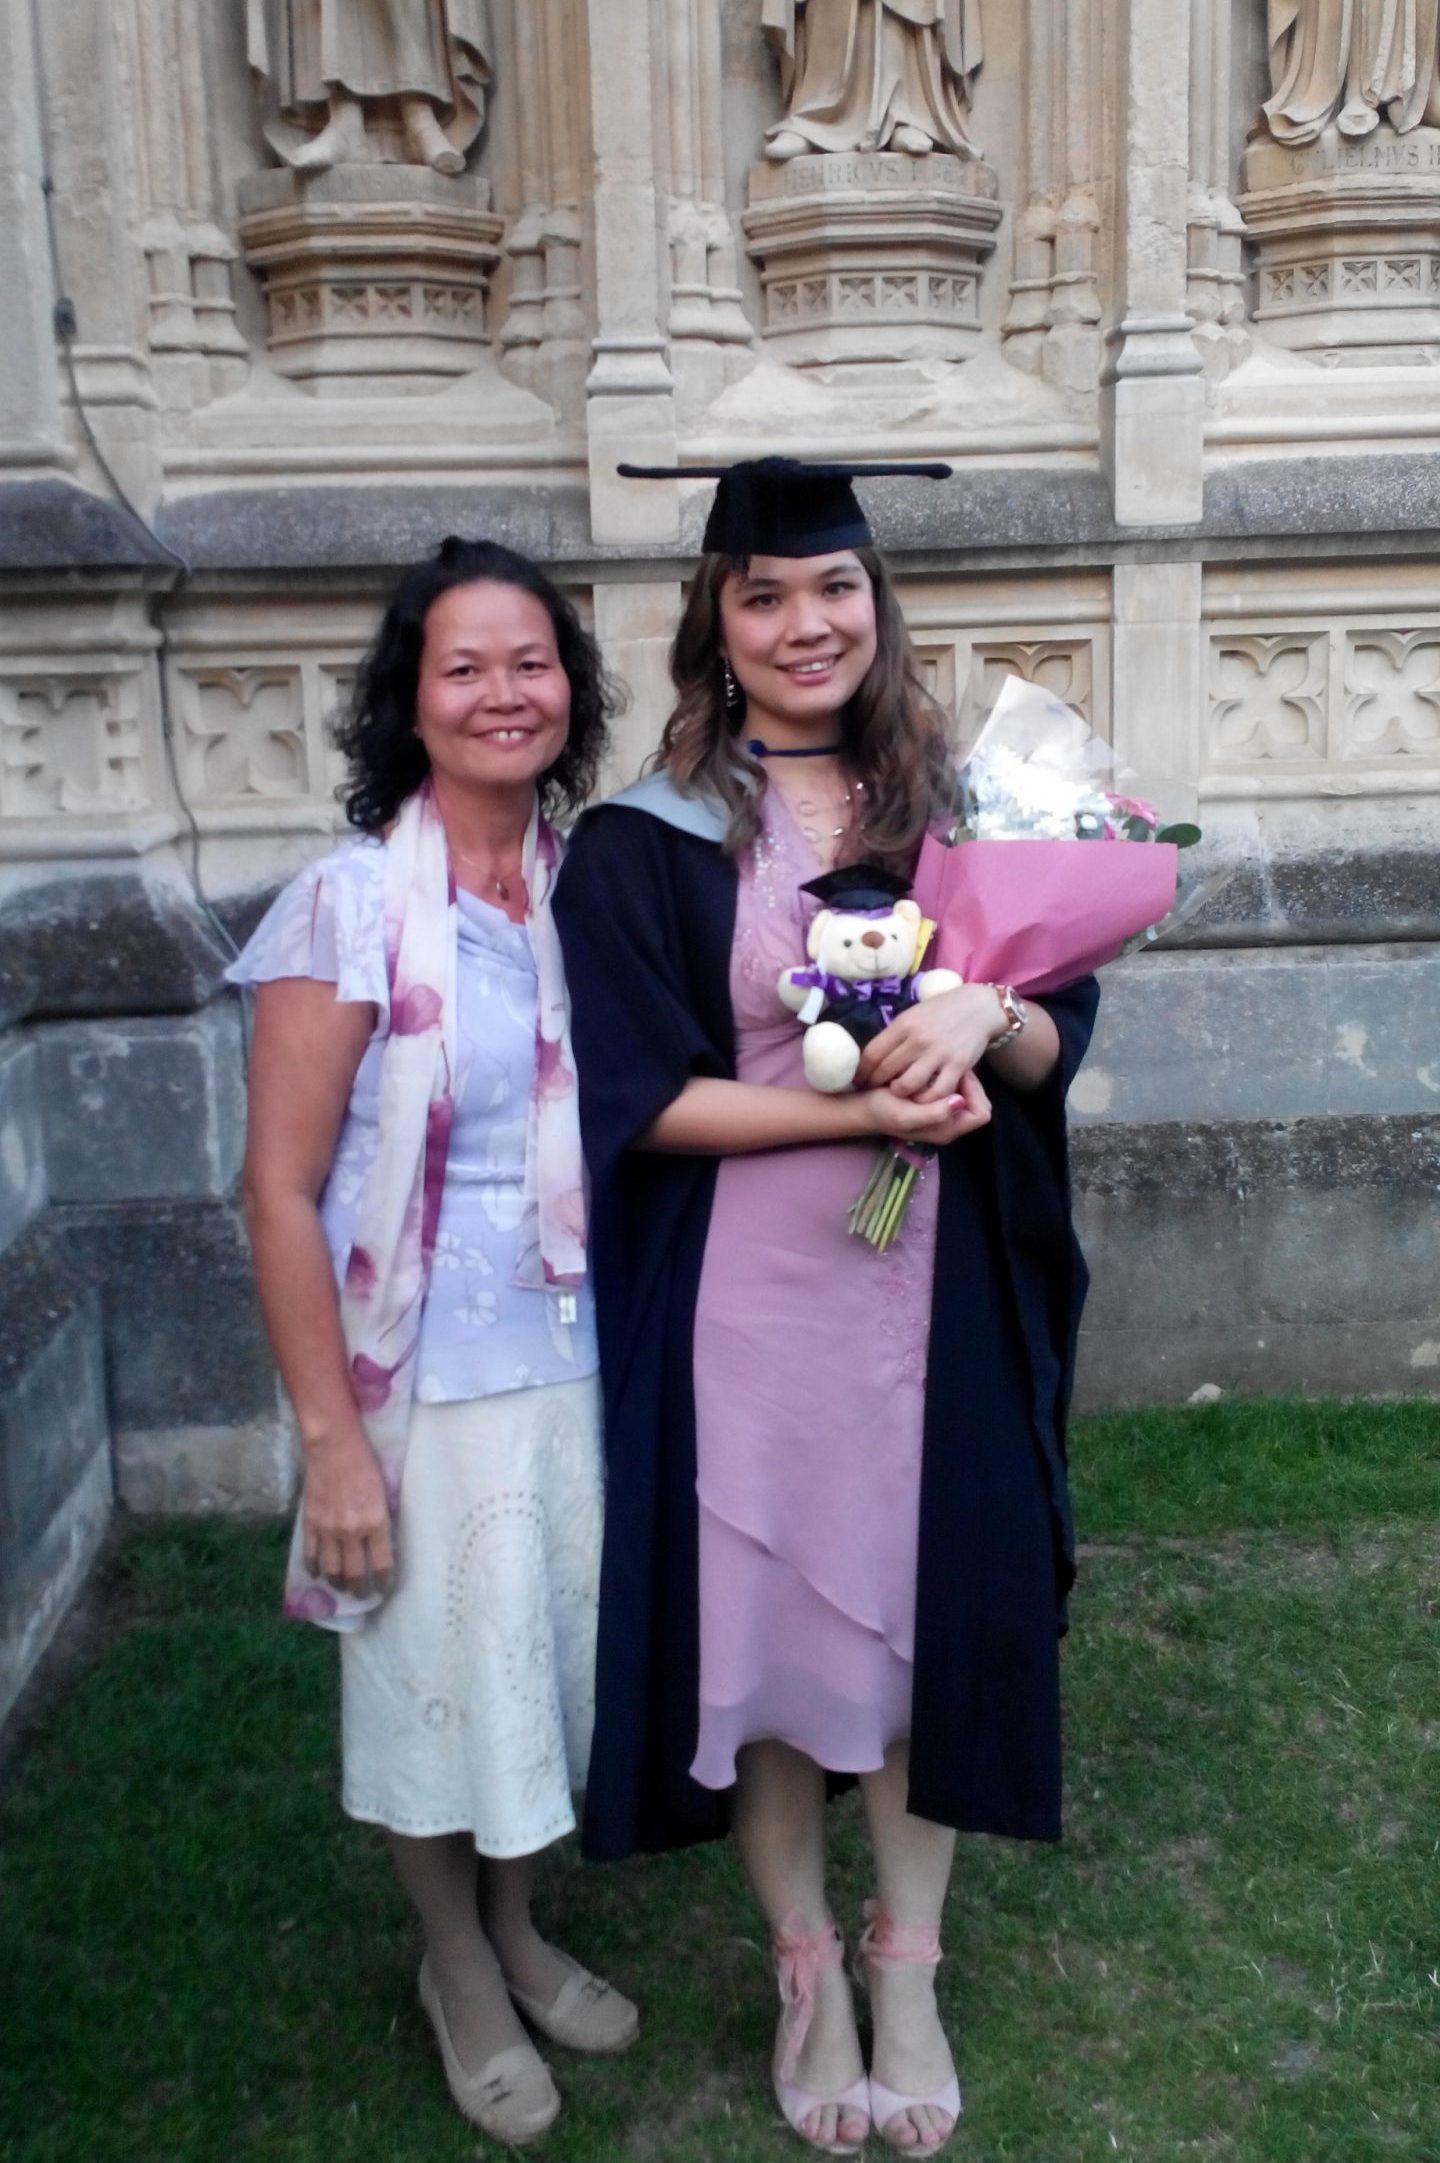 Kalysha Howard-Smith graduation photo with mother